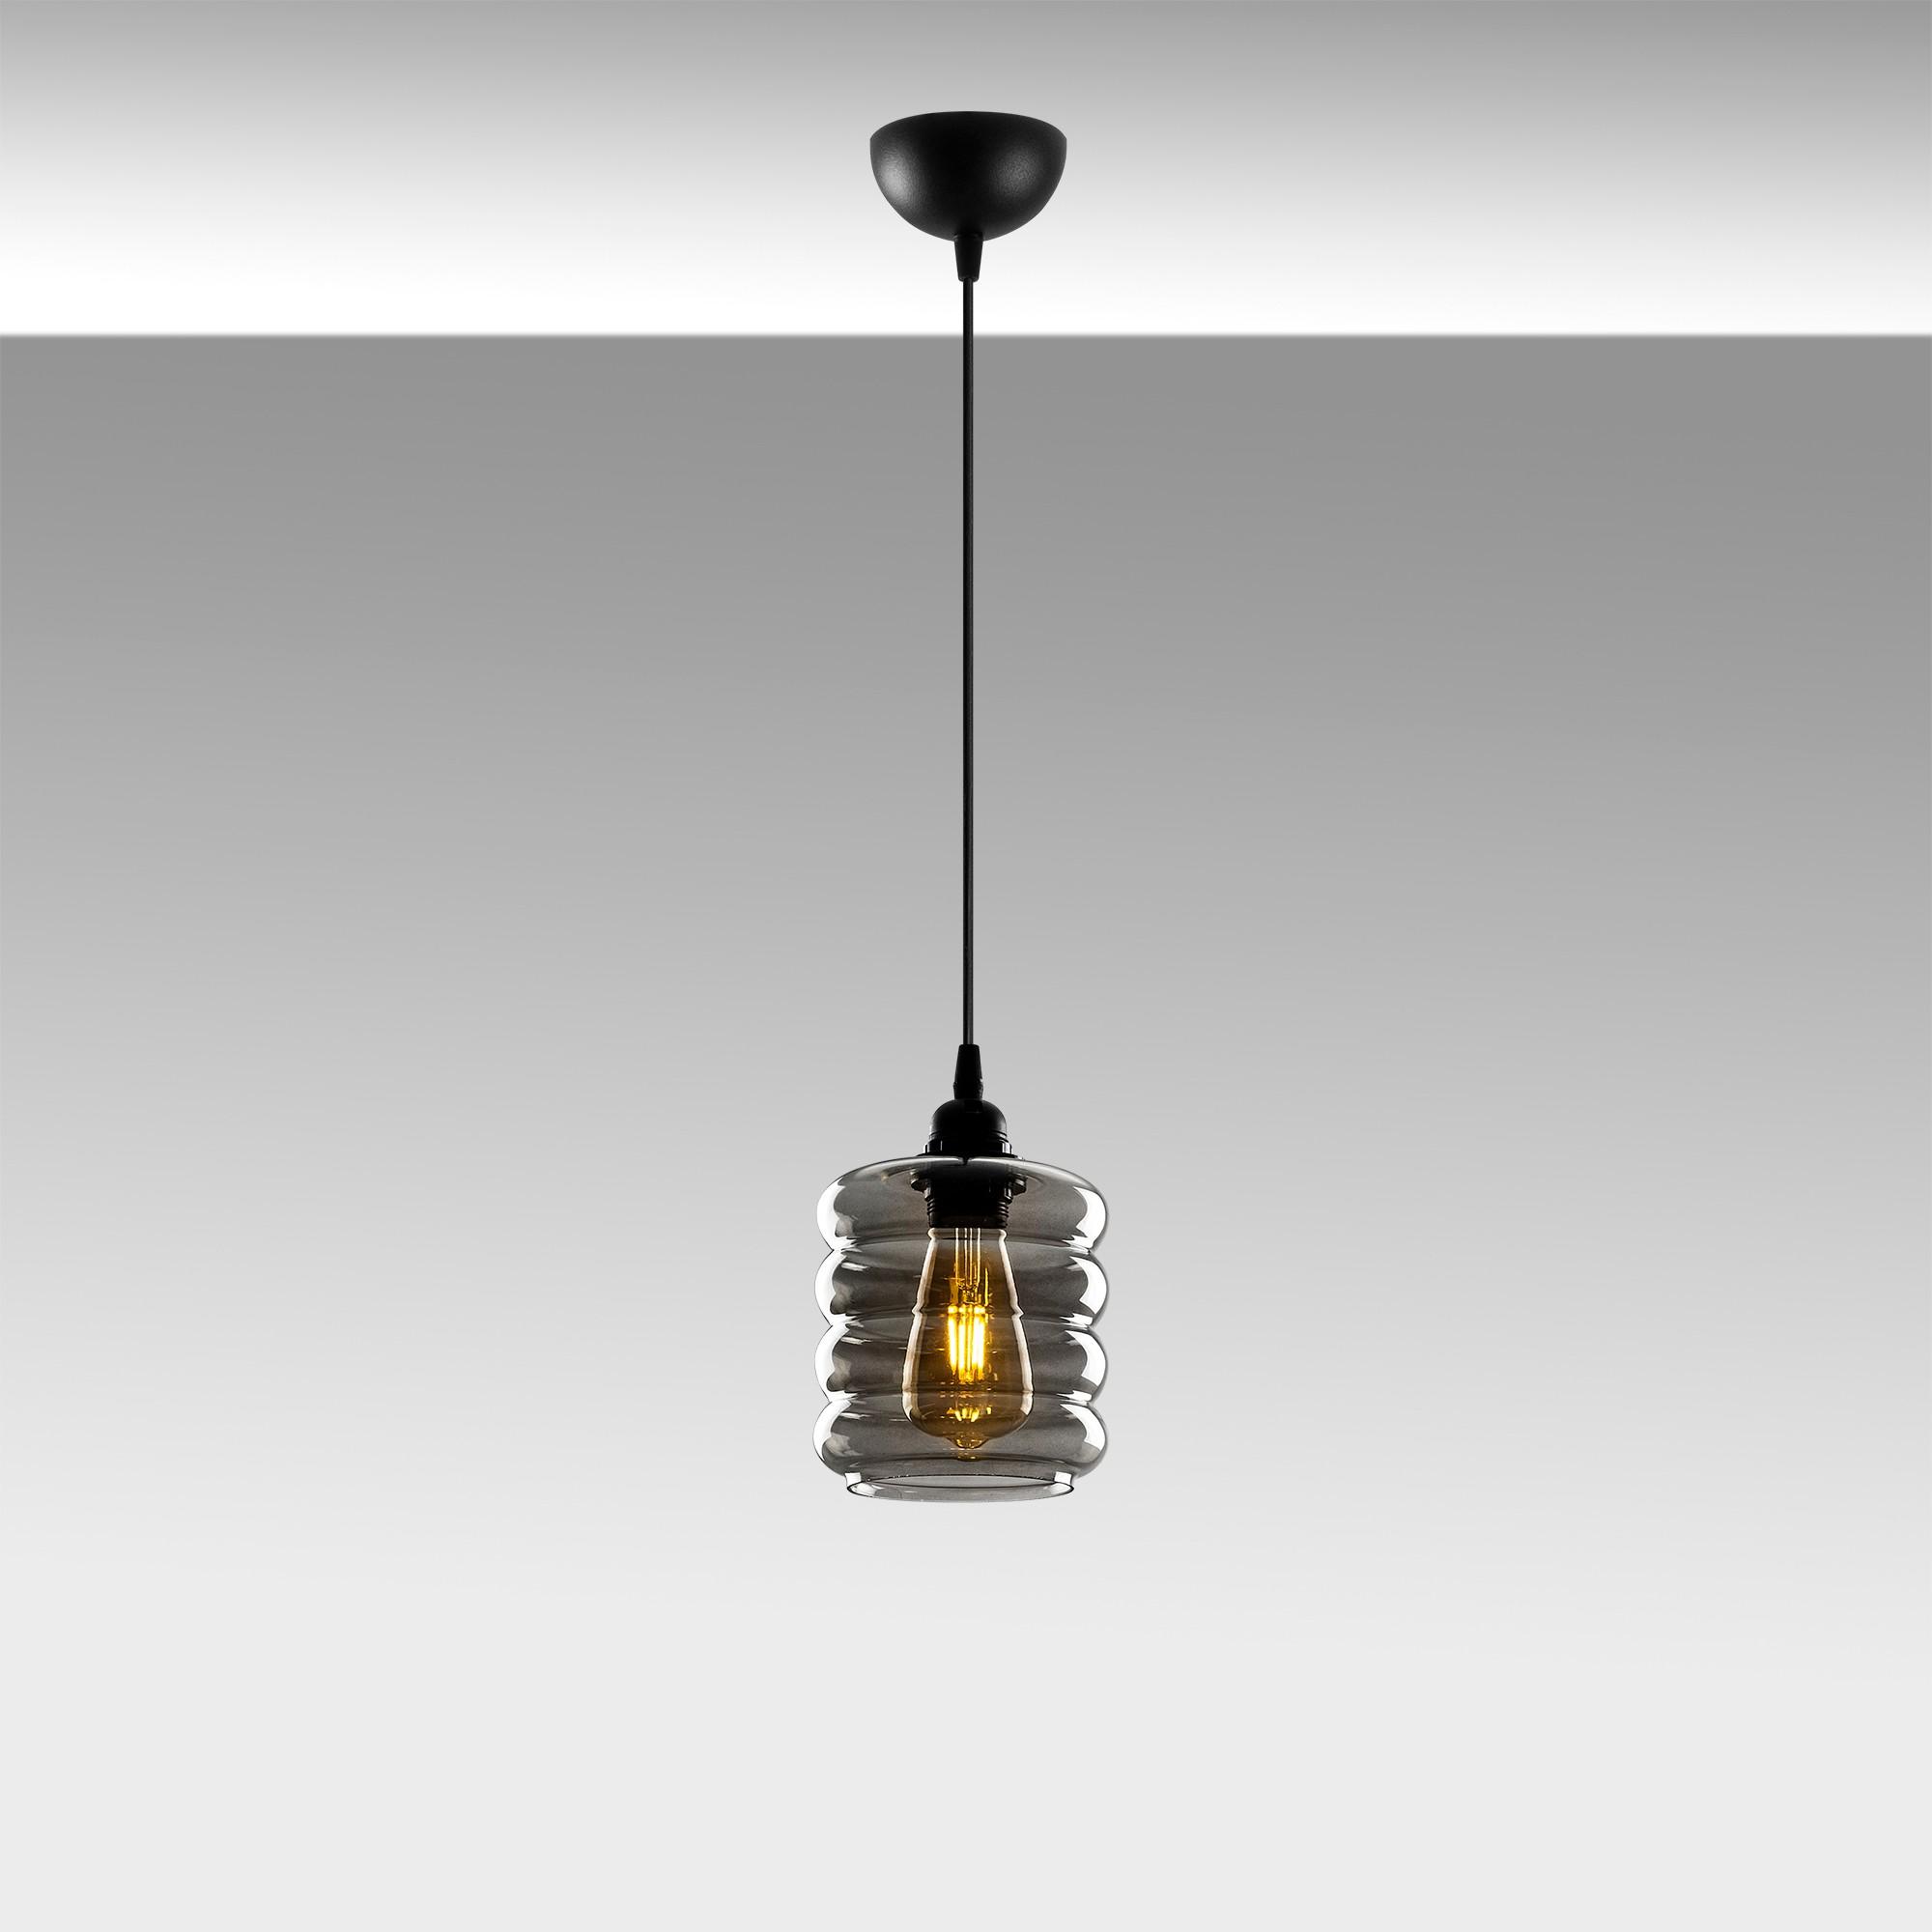 Led hanglamp met golven 1 x E27 fitting - sfeerfoto